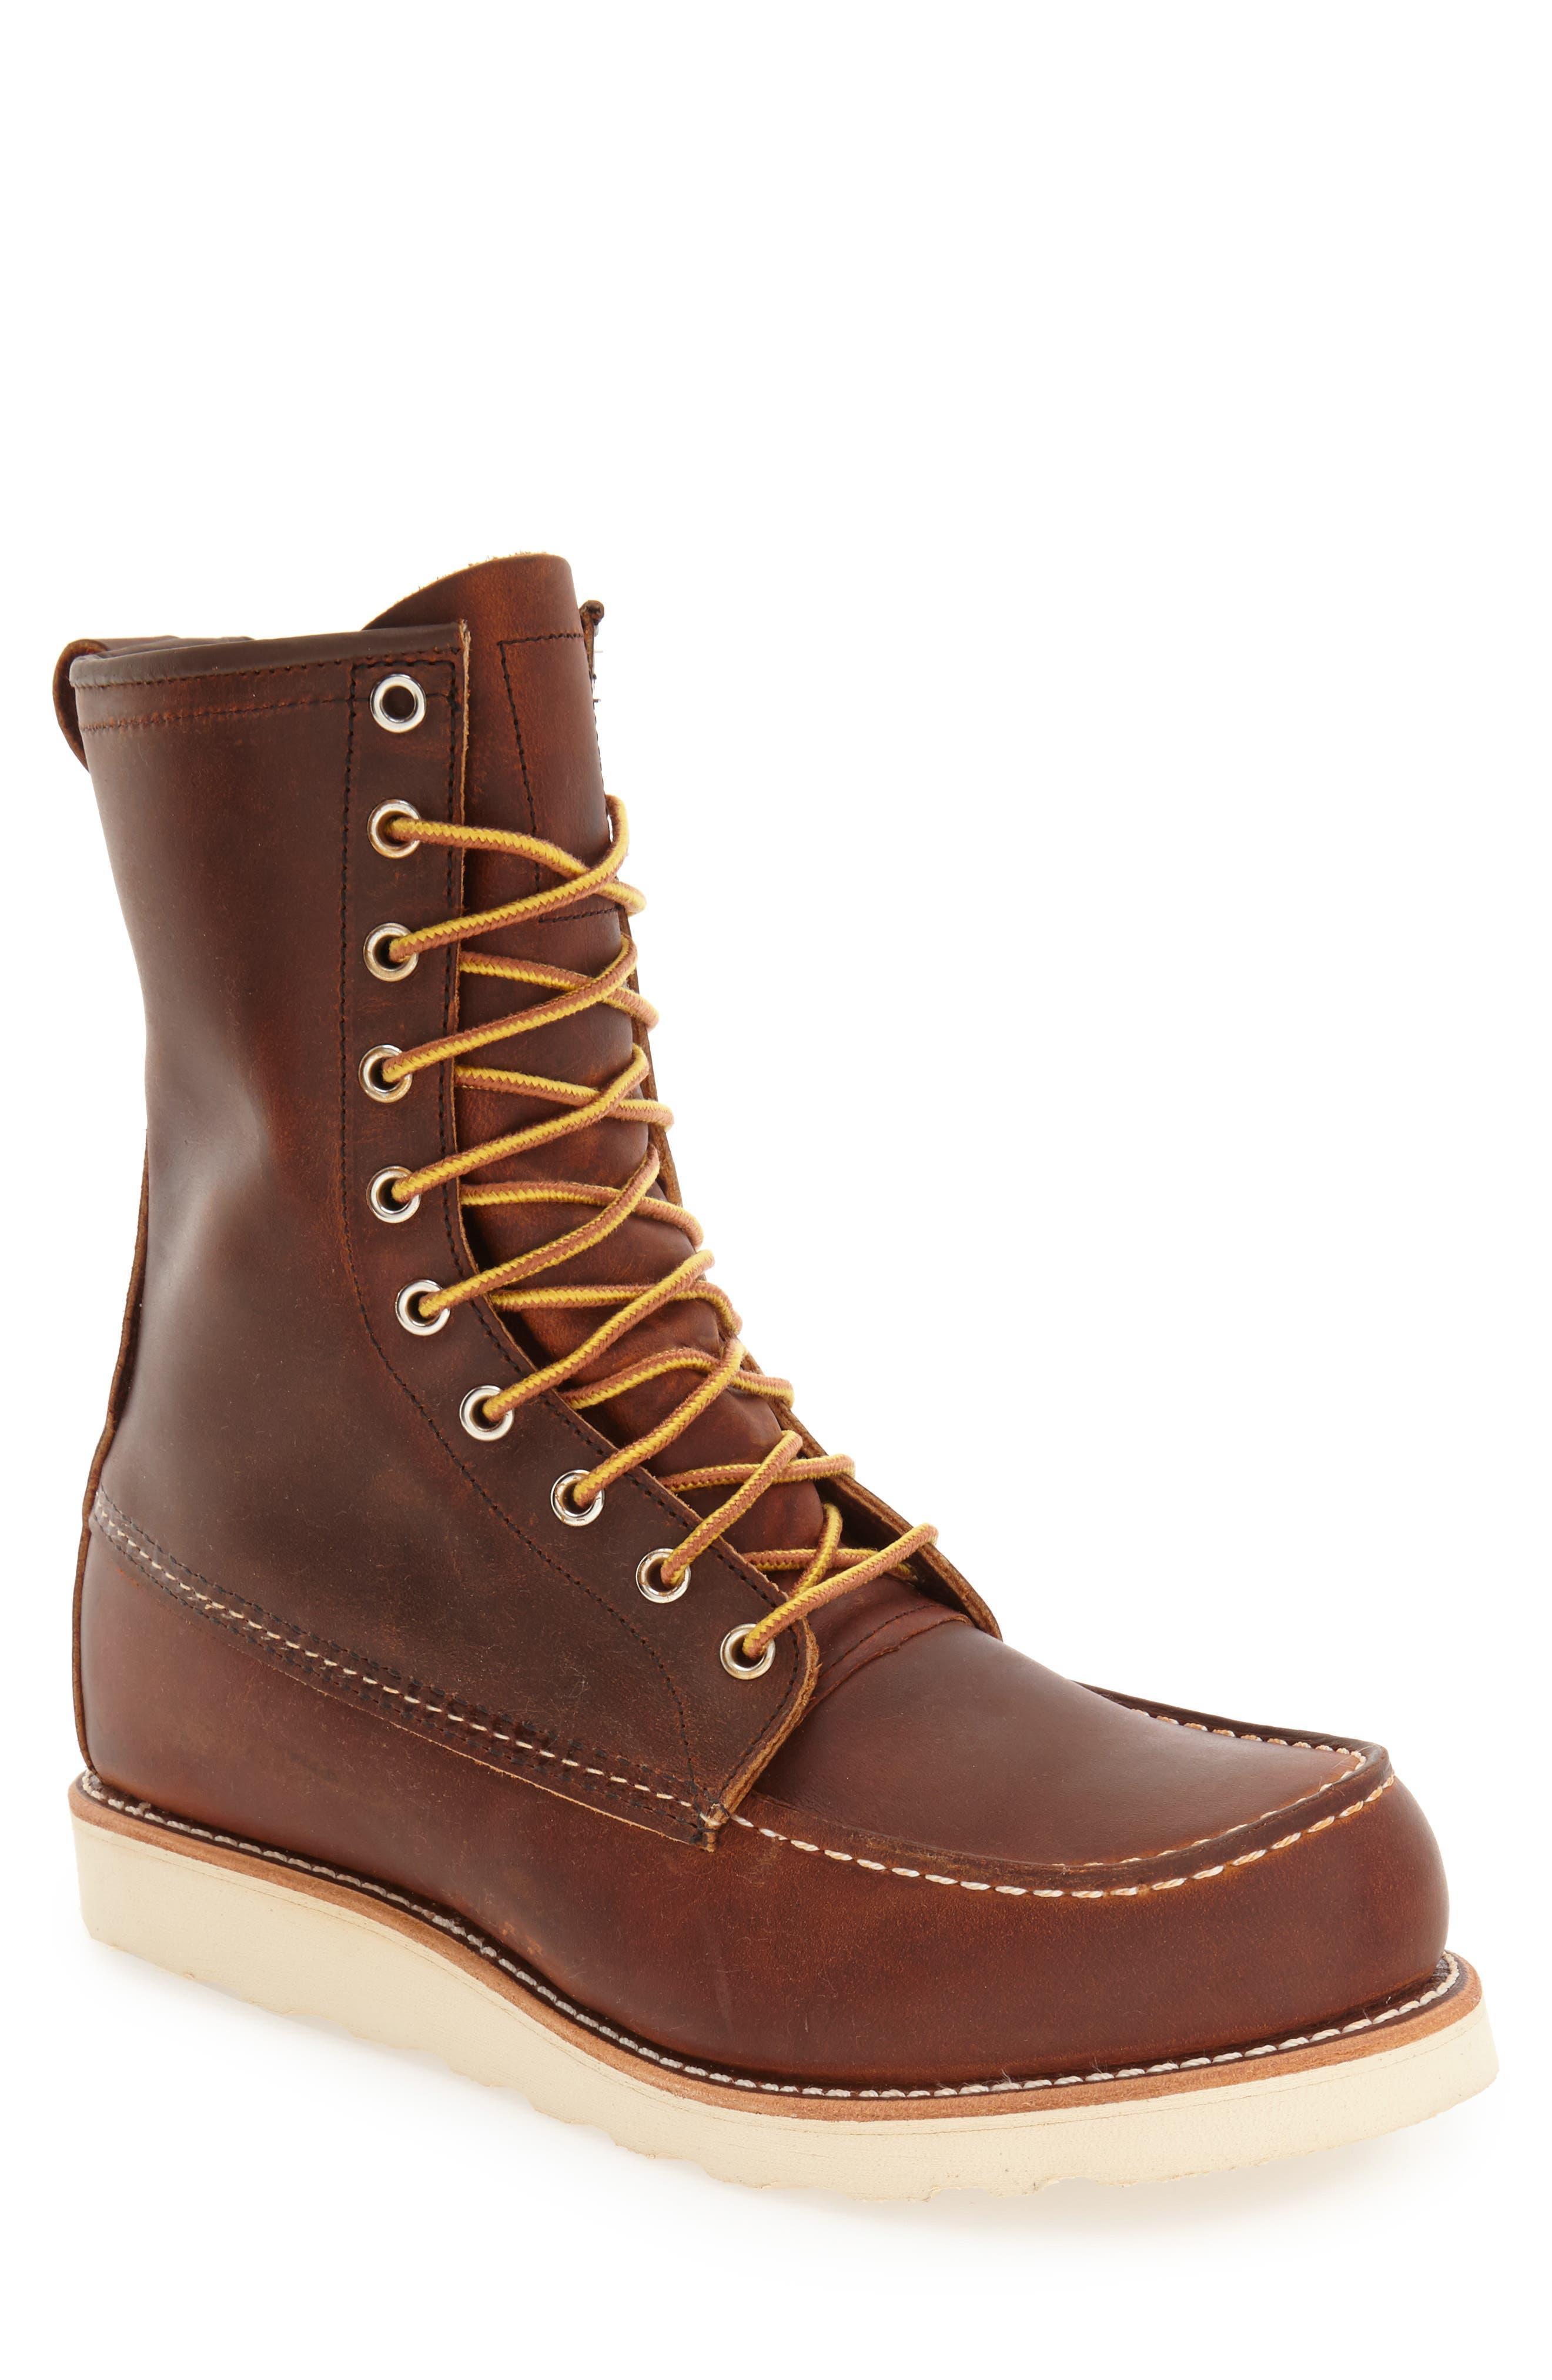 '877' Moc Toe Boot,                             Main thumbnail 1, color,                             COPPER LEATHER